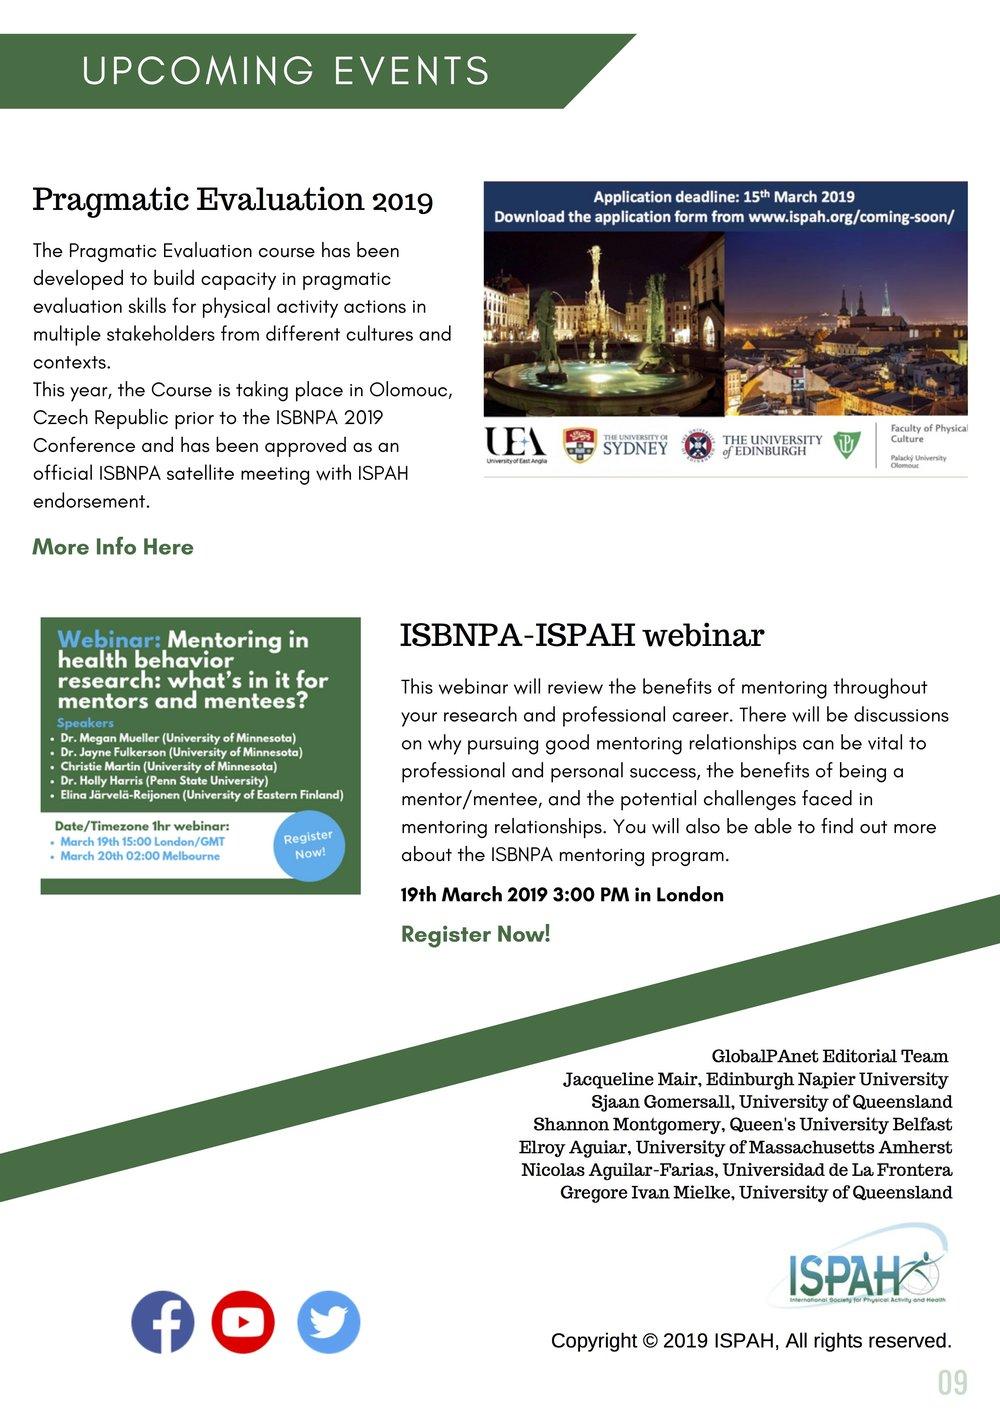 GlobalPANet Issue 1[1]_9.jpg